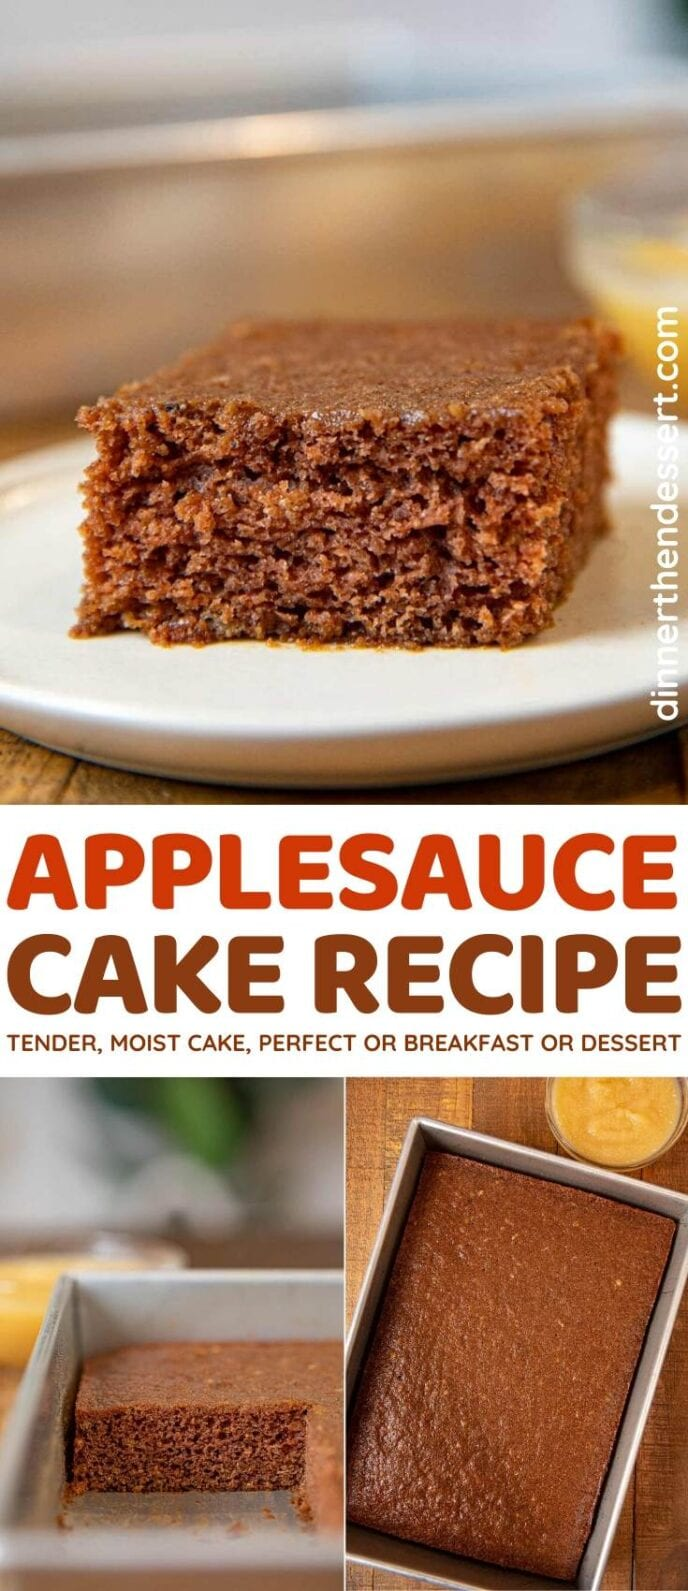 Applesauce Cake collage